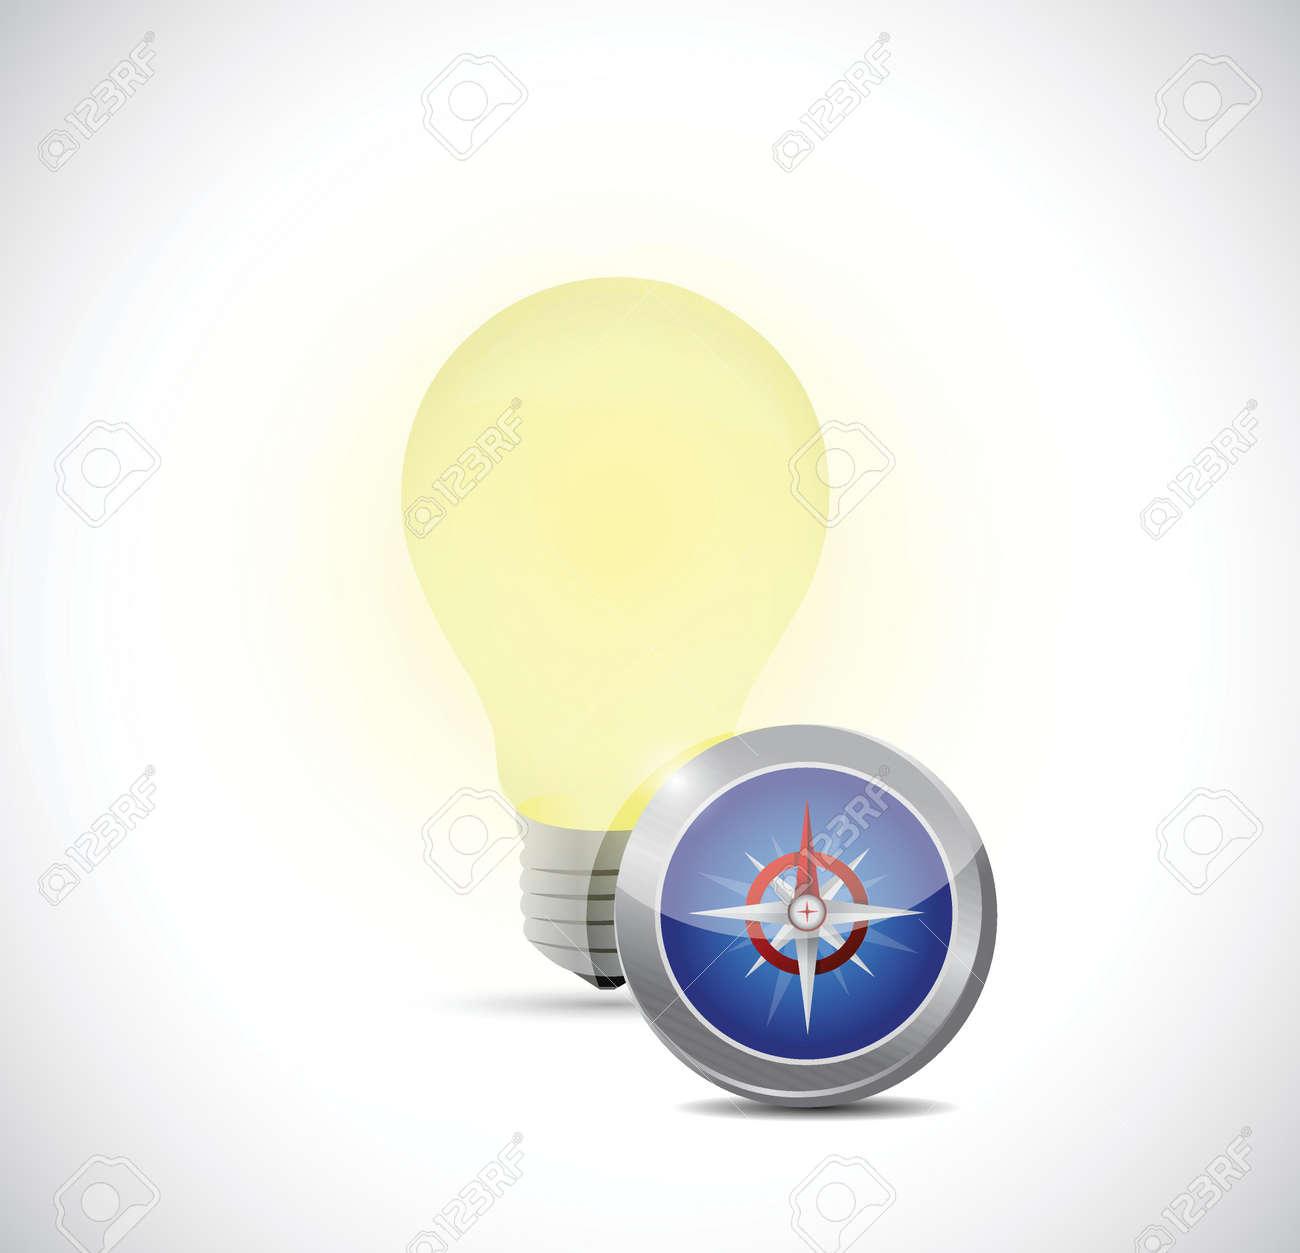 idea concept light bulb illustration design over a white background Stock Vector - 26504203